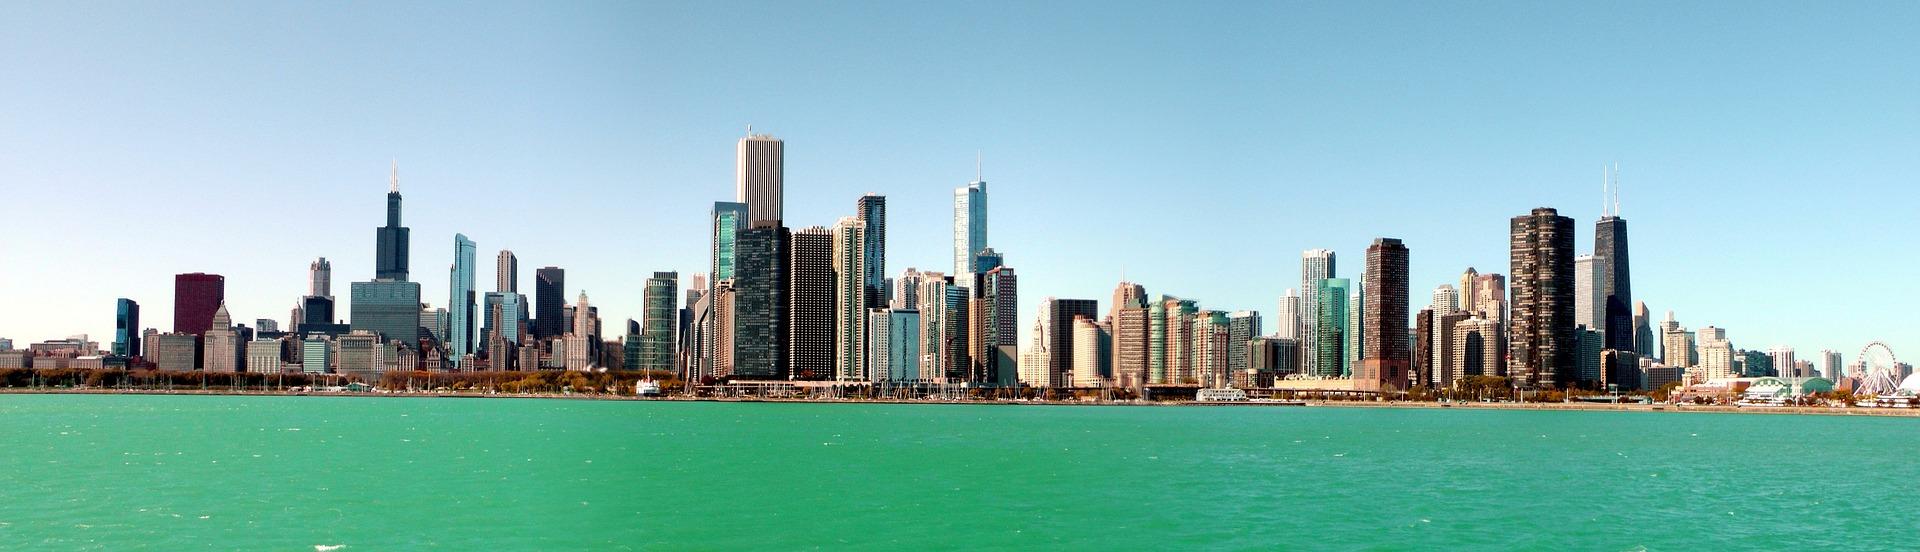 chicago-587677_1920